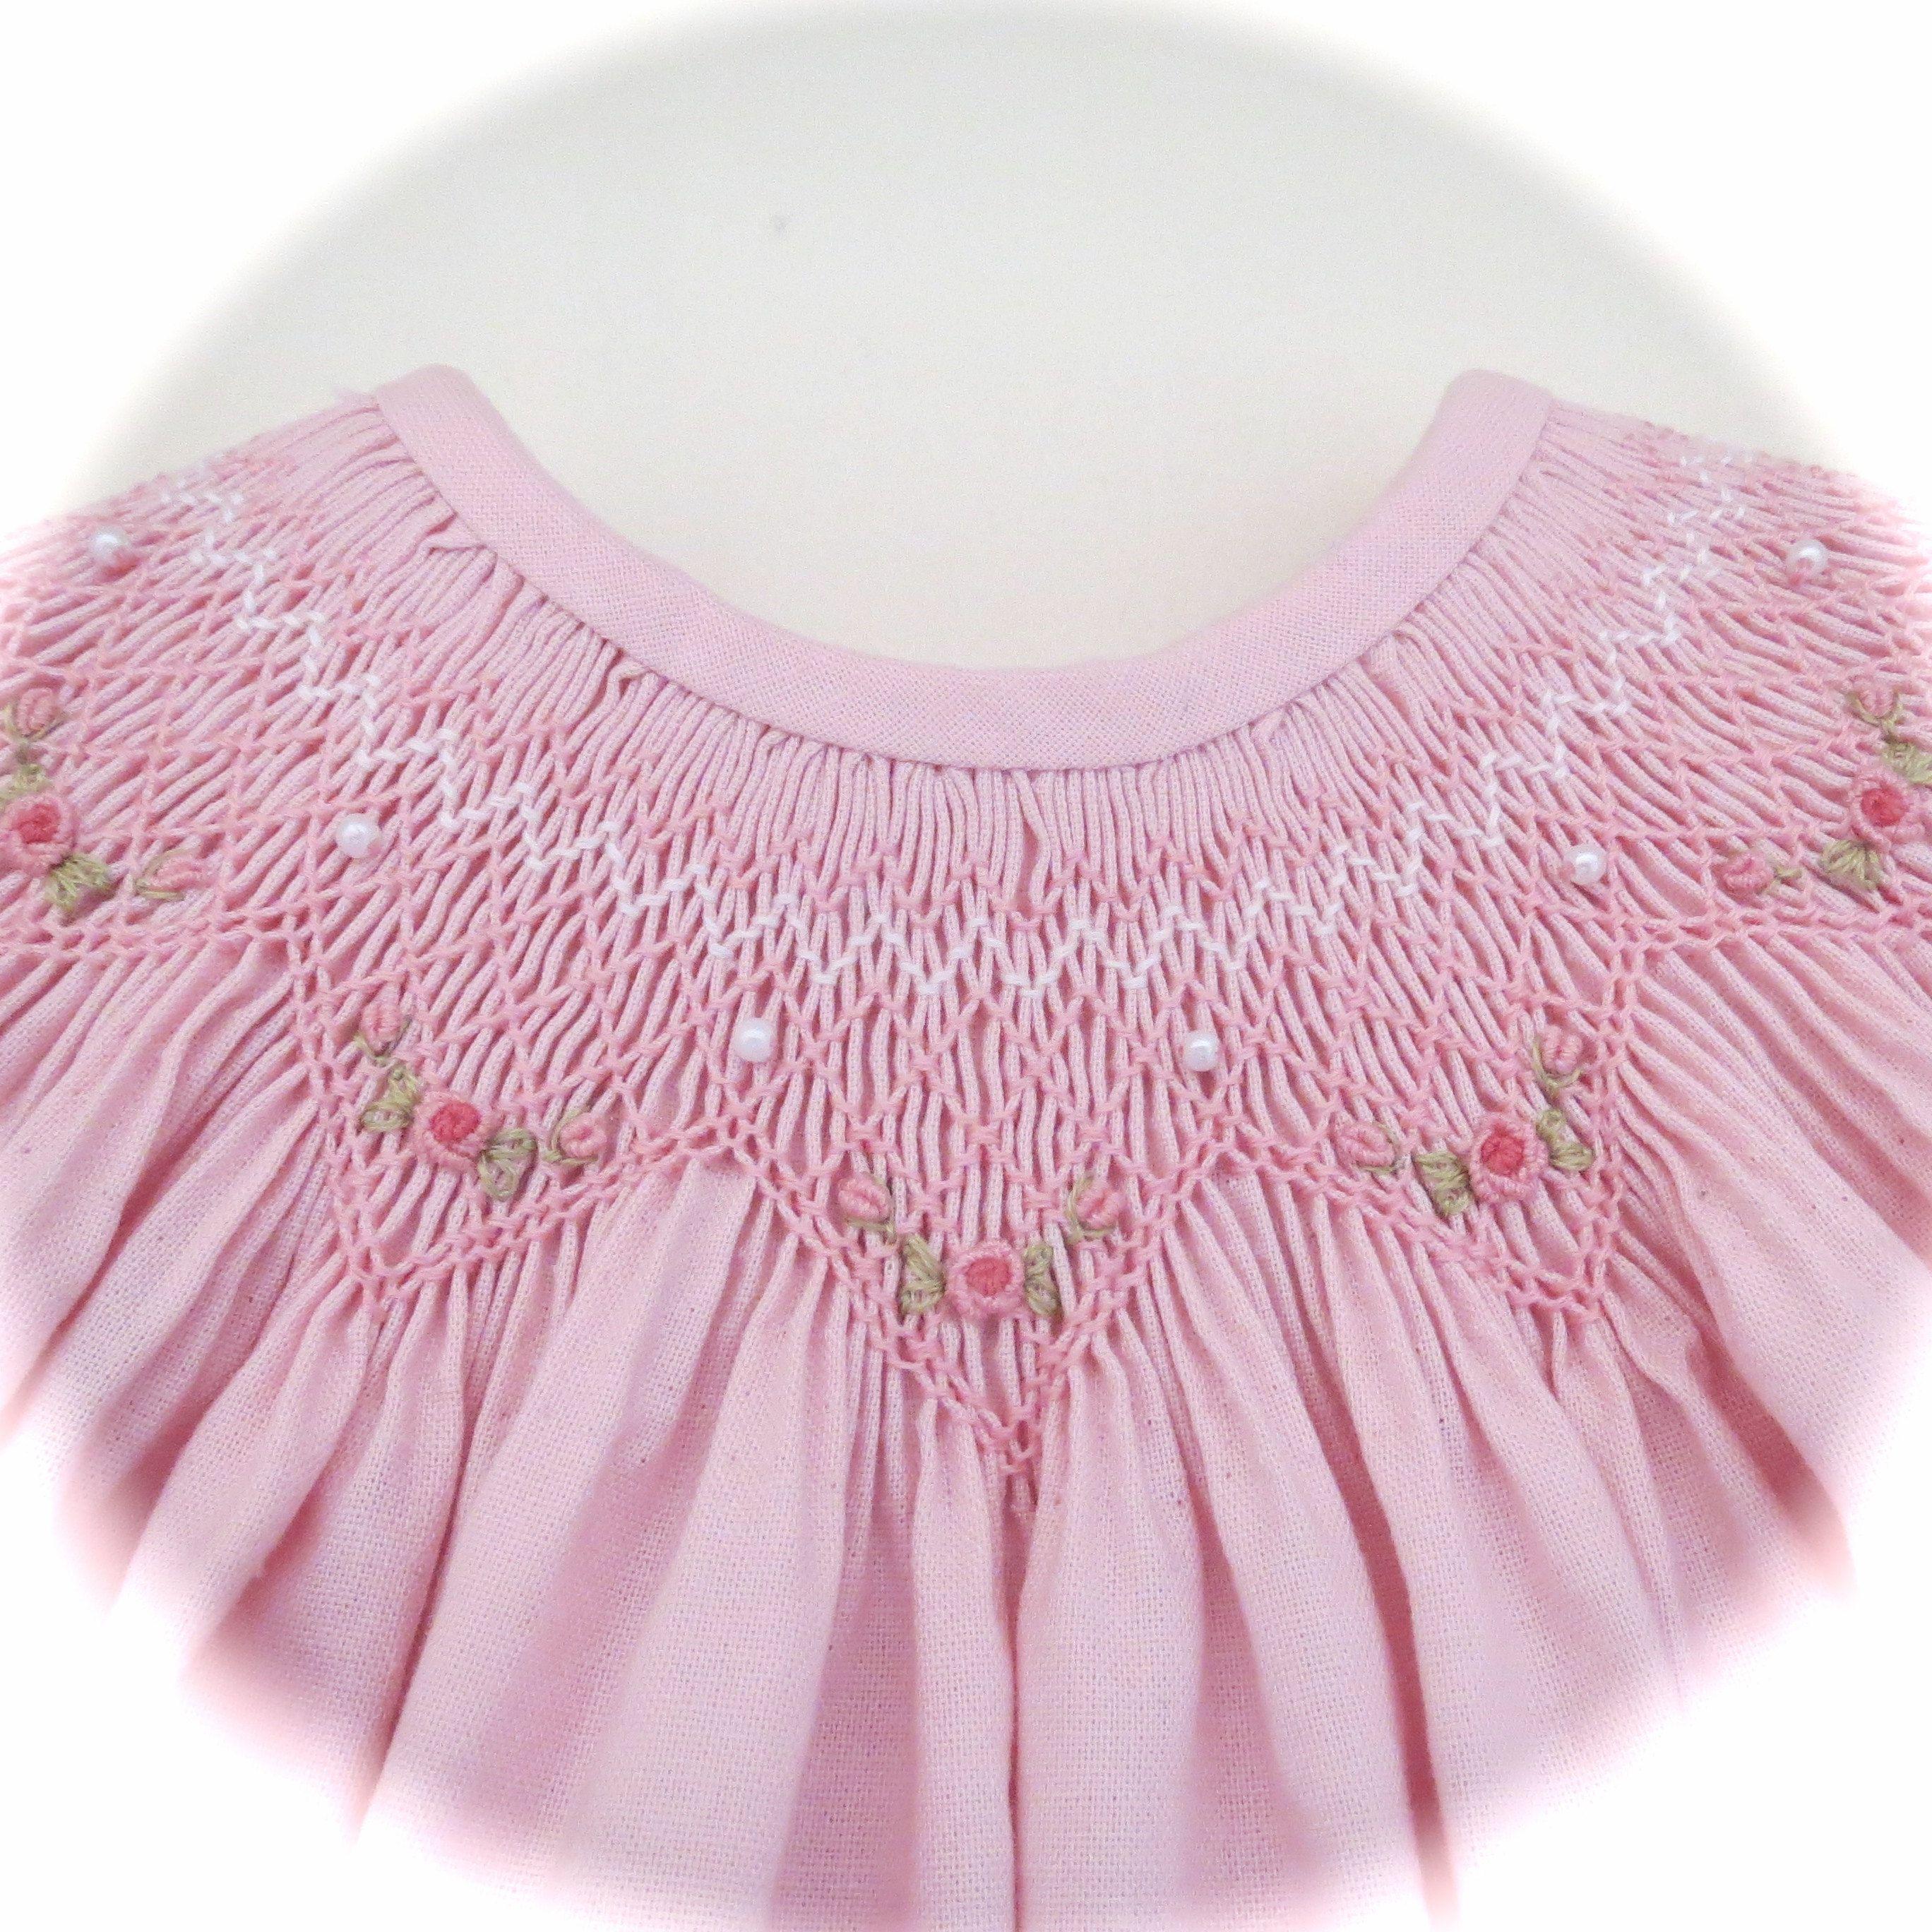 Lovely Light Pink and White Hand Smocked Dress for Baby Girl ...